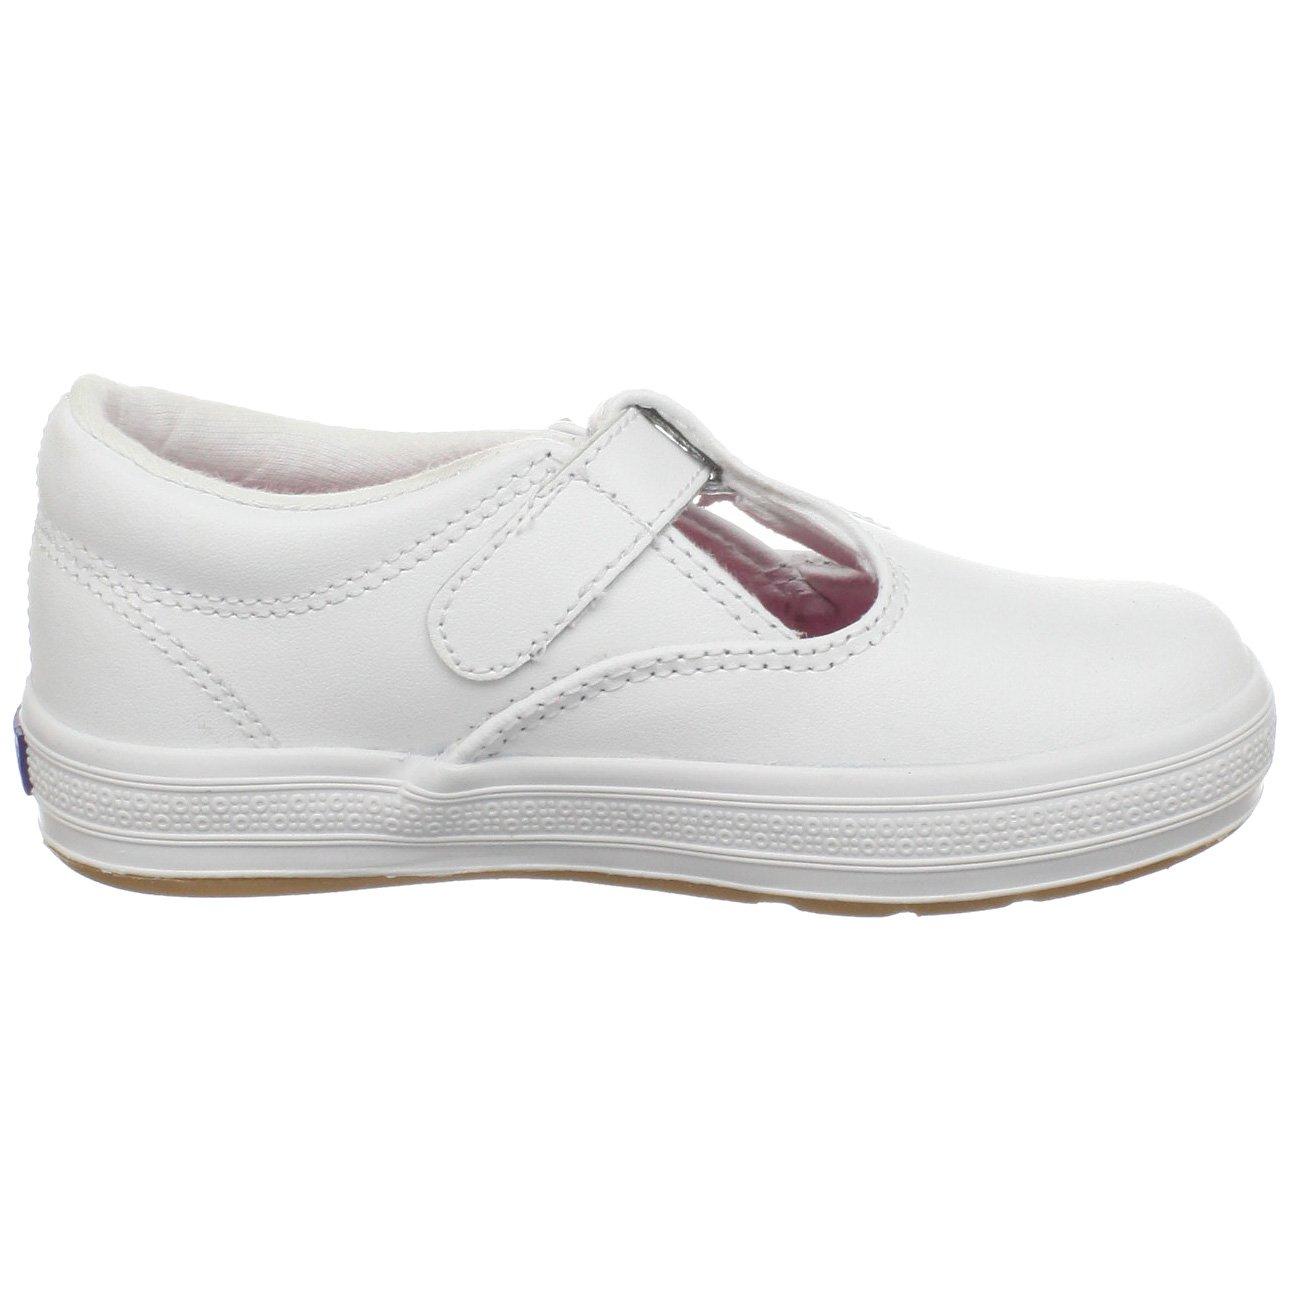 Keds Daphne T-Strap Sneaker (Toddler/Little Kid), White, 12 M US Little Kid by Keds (Image #6)